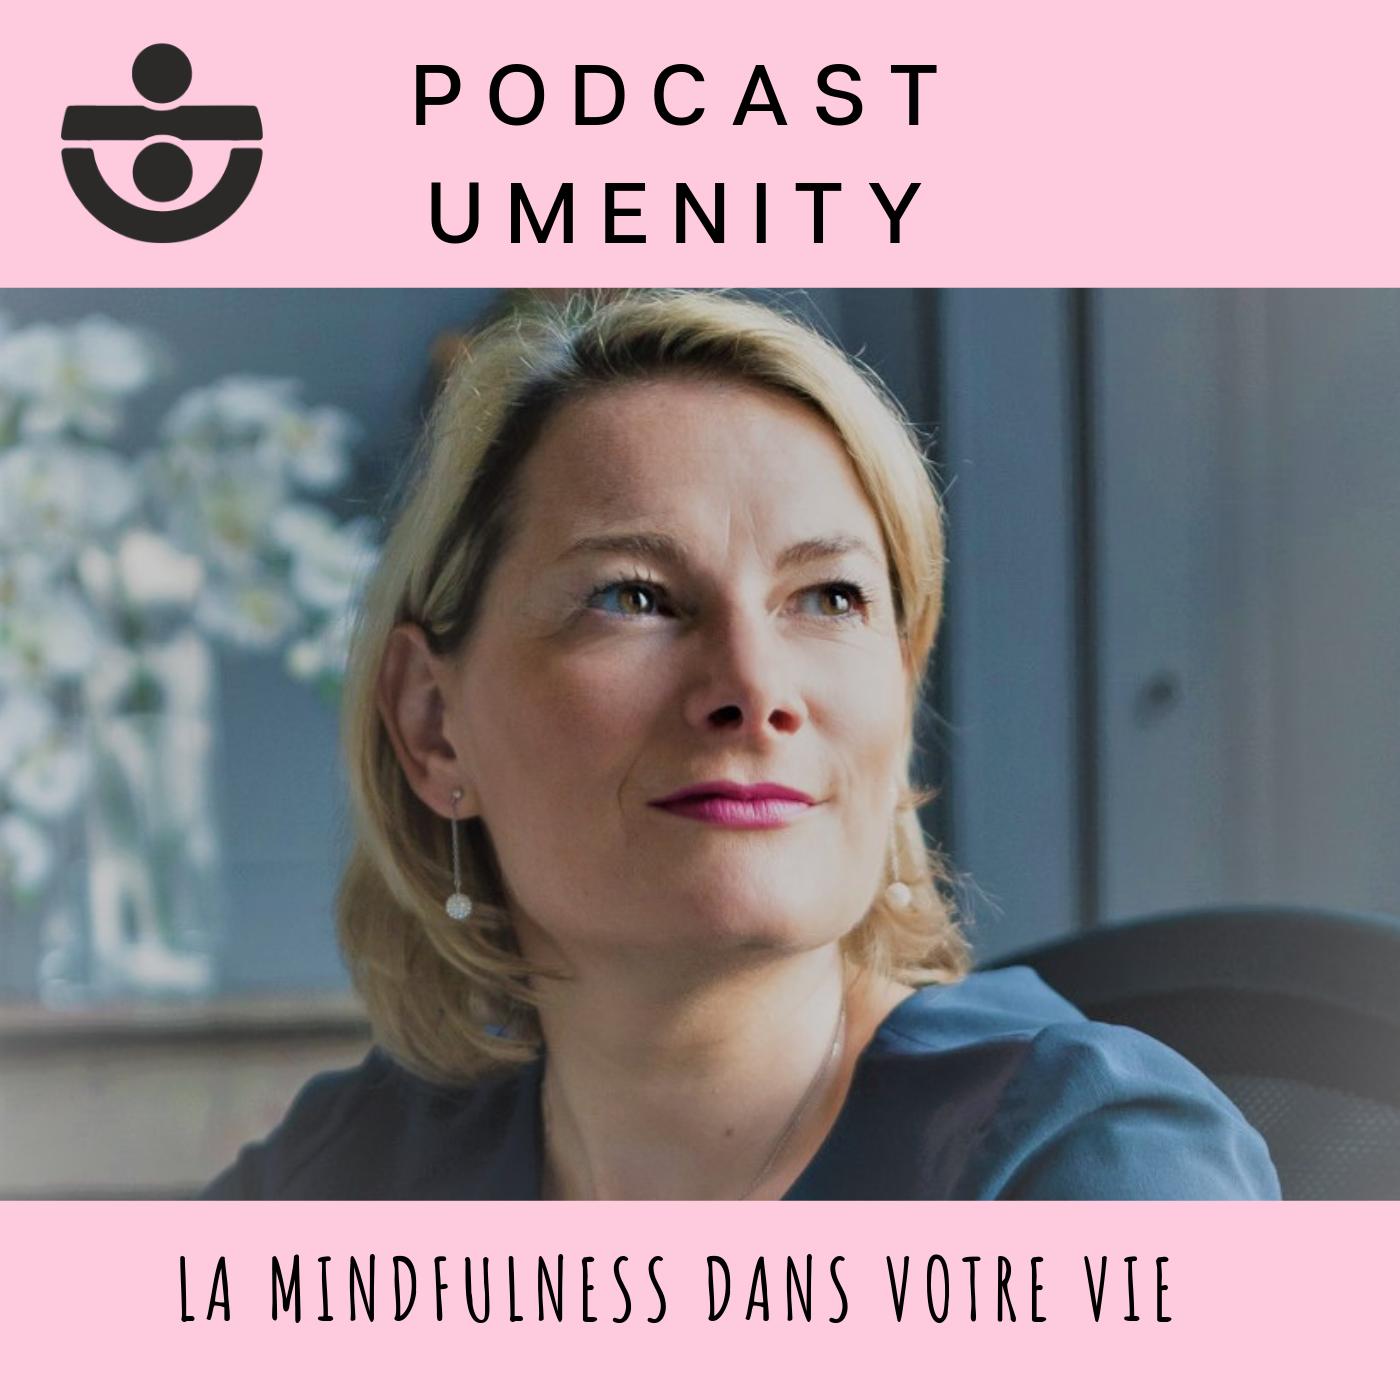 Umenity, la mindfulness dans votre vie